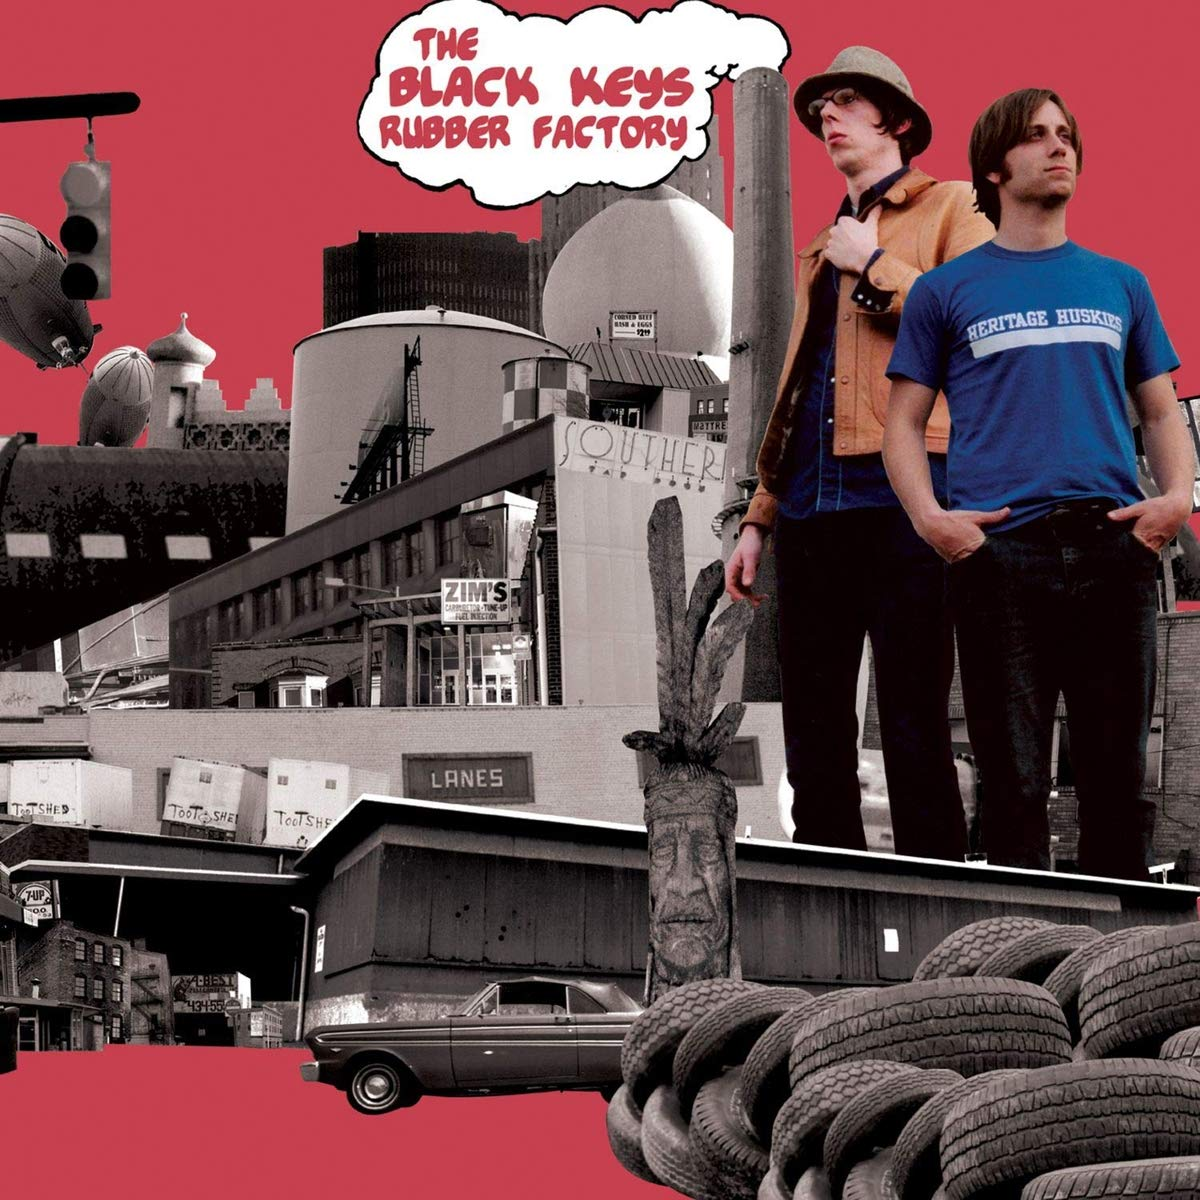 Rubber Factory [Vinyl] by black keys